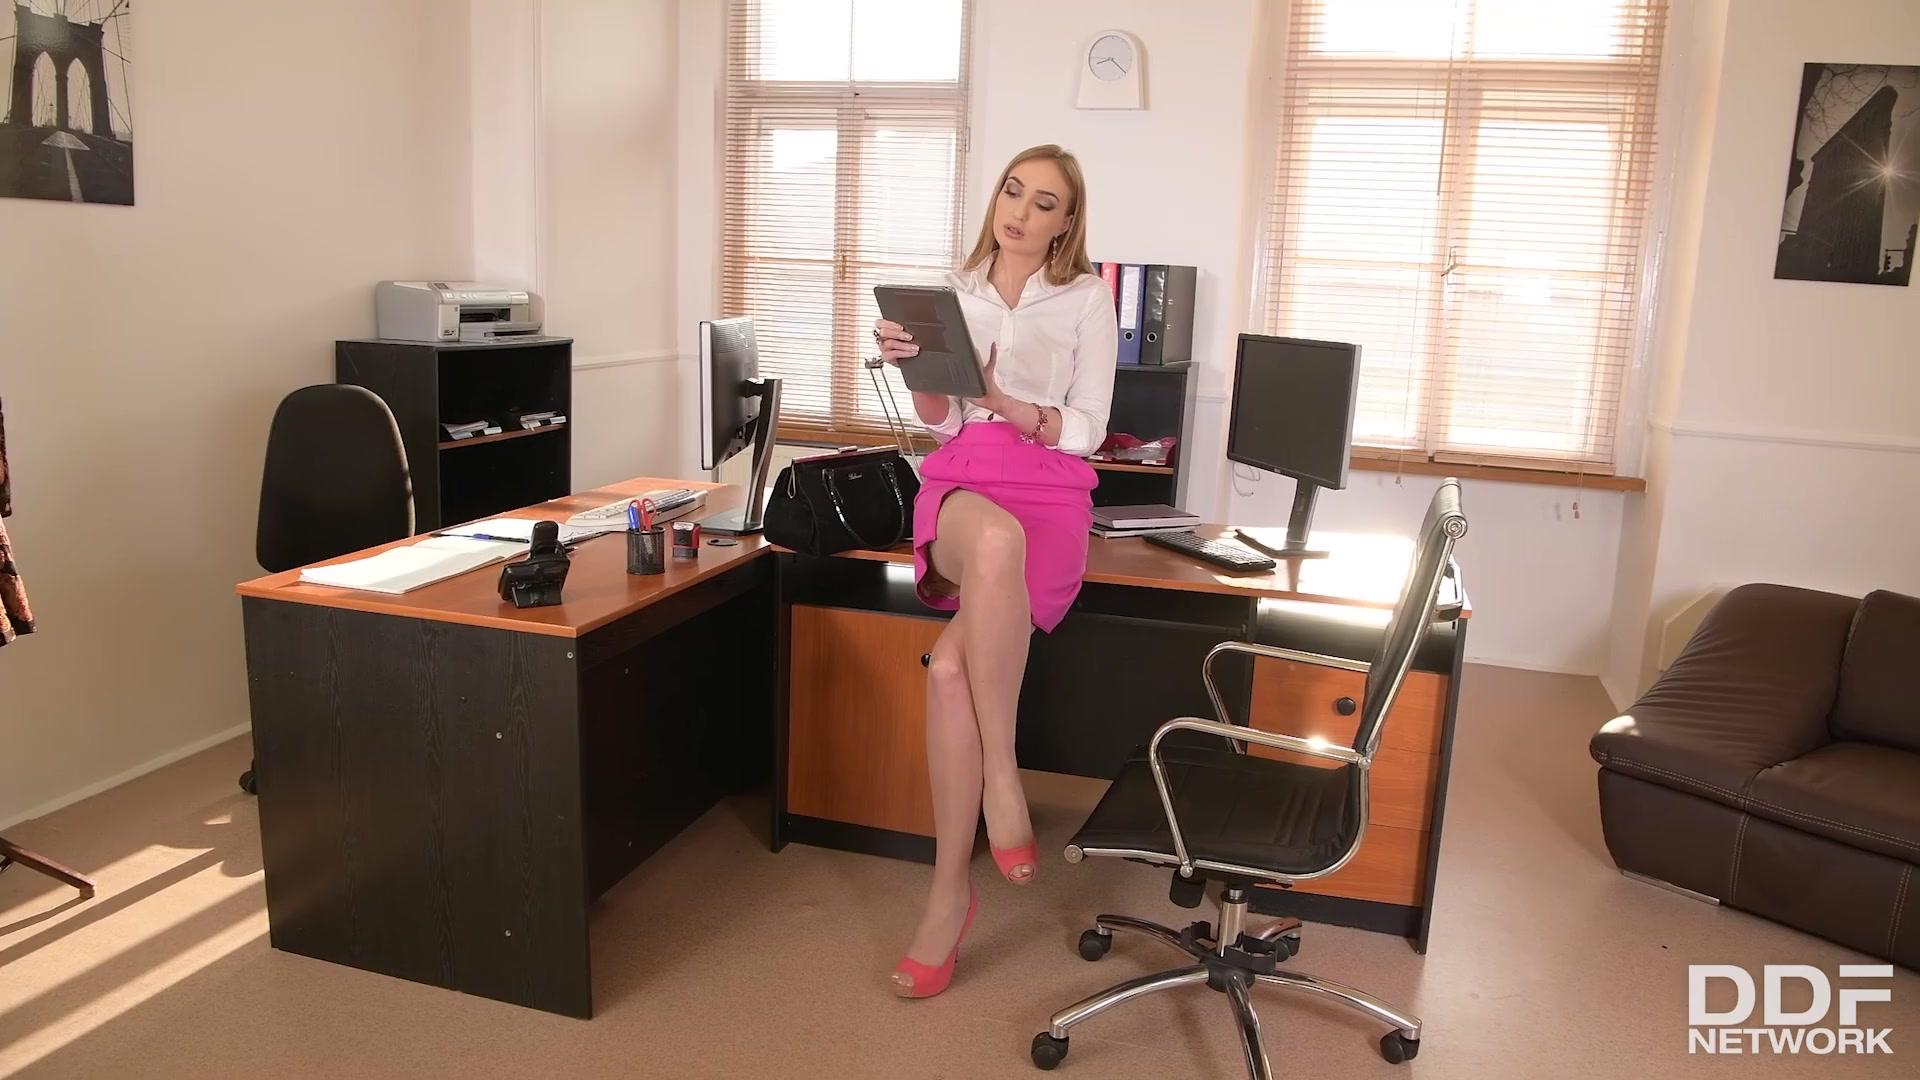 Уборщик и босс трахнули худую секретаршу